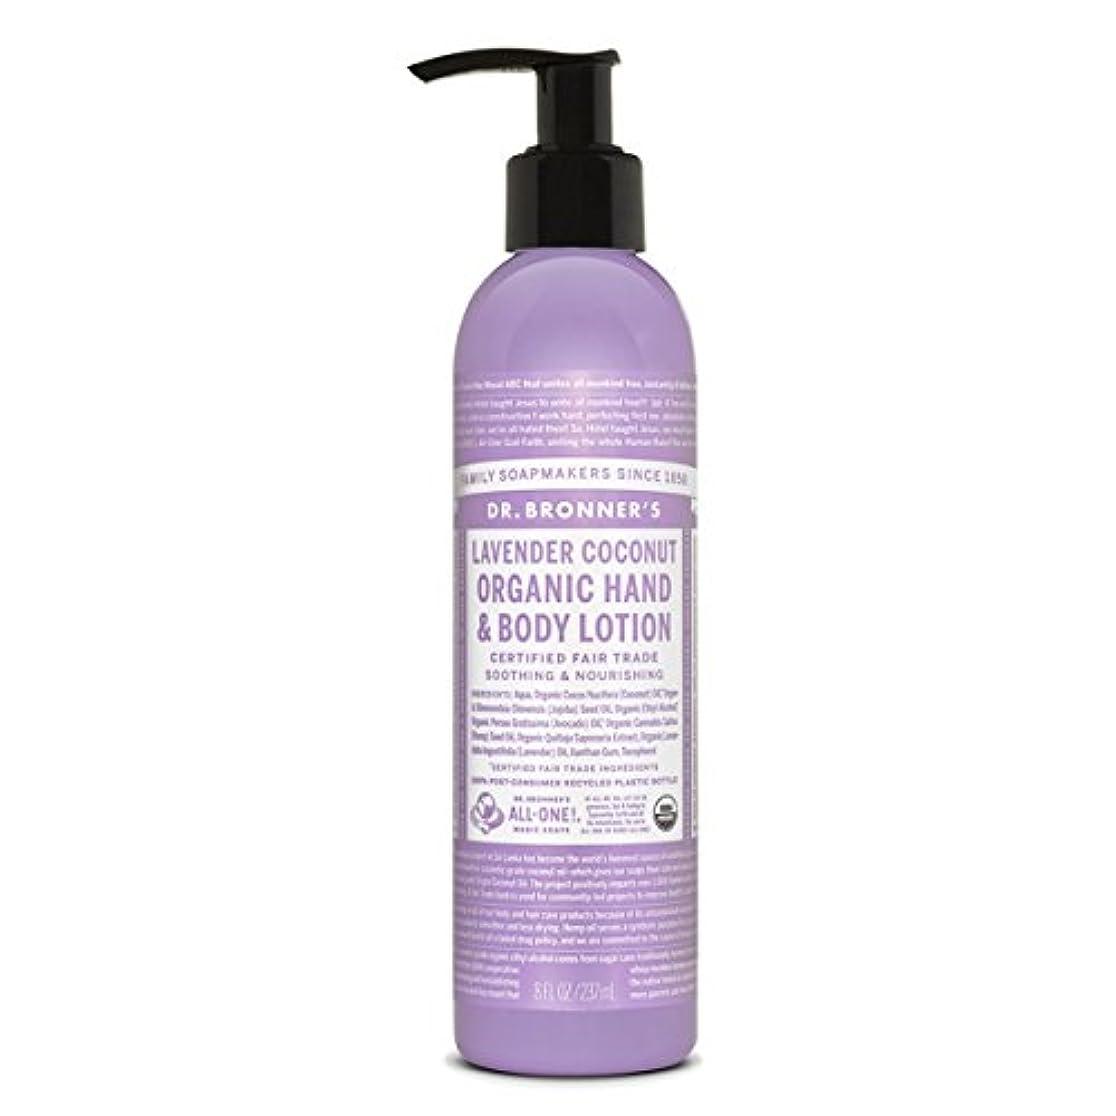 Dr. Bronner's Organic Lavender Coconut Lotion 235 ml (並行輸入品)